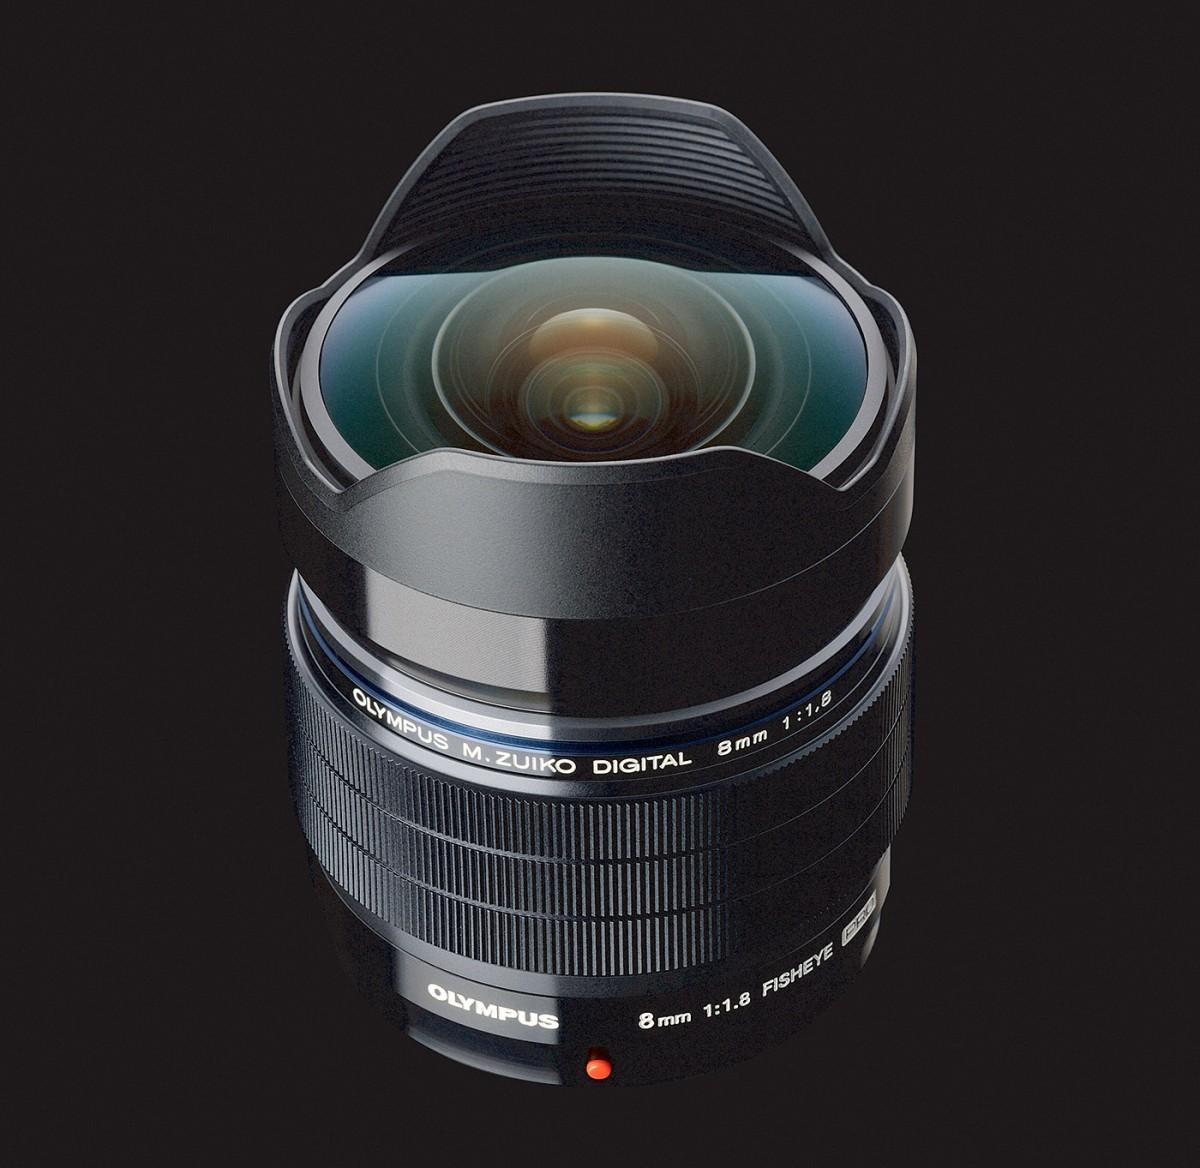 Olympus M.Zuiko Digital ED 8mm f/1,8 Fisheye Pro